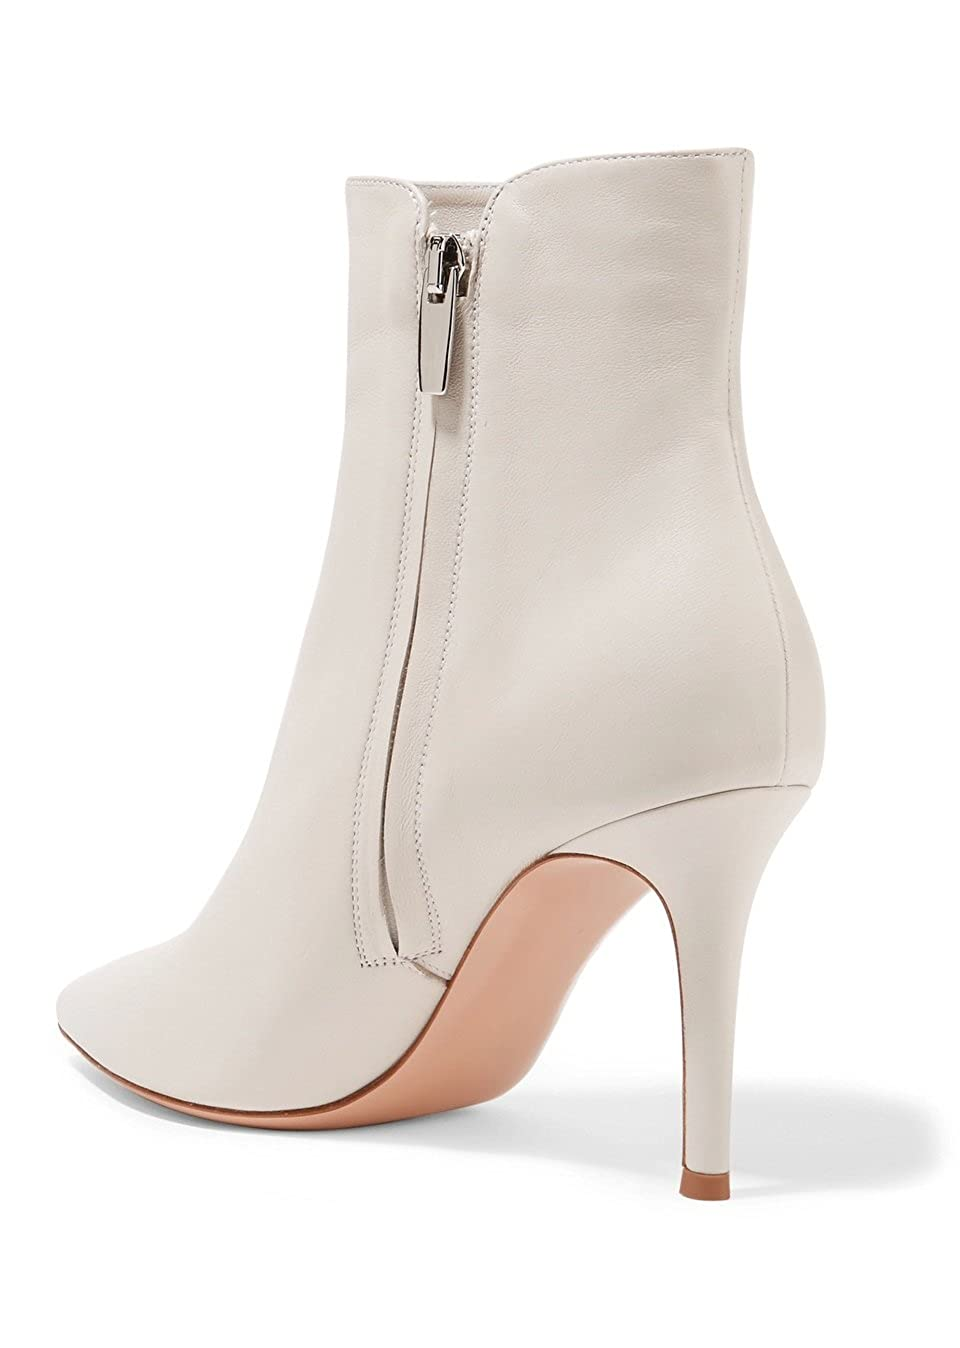 Soireelady Damen Ankle Stiefel  Stiefeletten Zipper     Leder-Optik Schuhe   8 cm High Heels   Kurzschaft Stiefel mit Absatz  fbe931